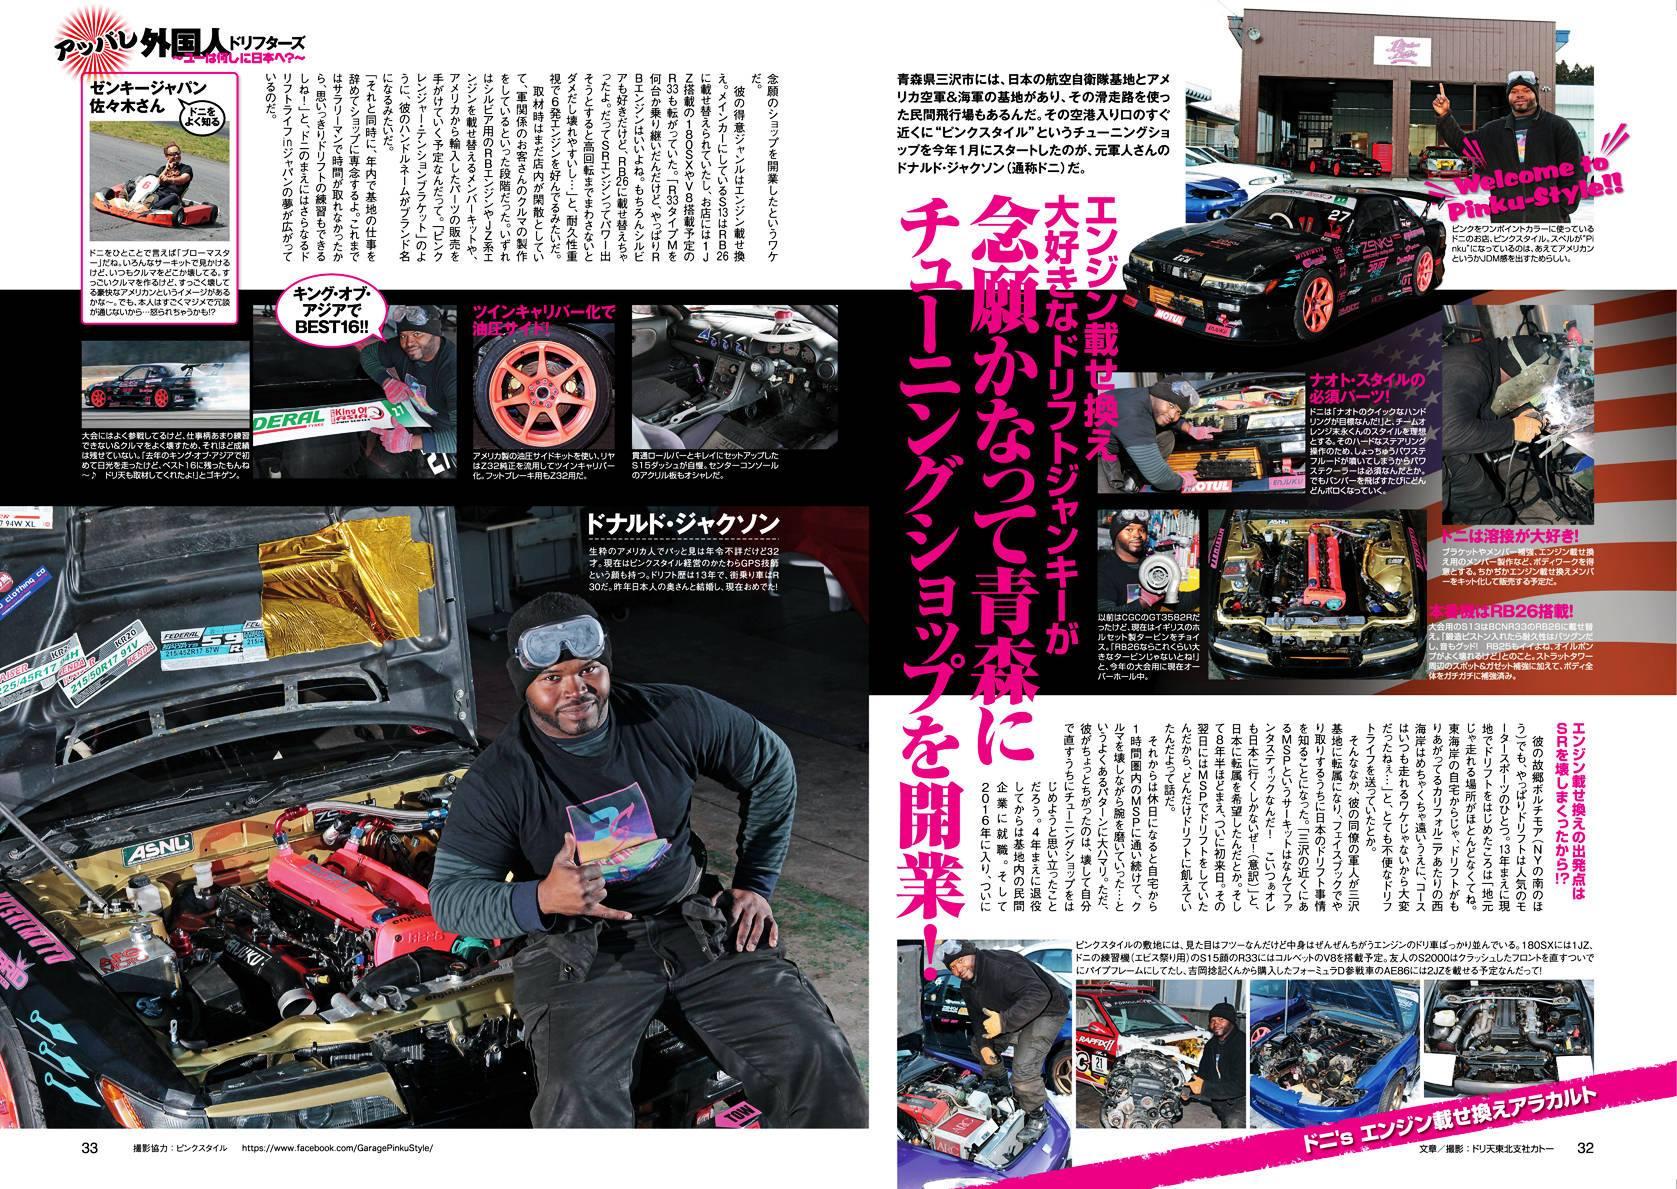 Pinku Style Drift Tengoku 2016 New Shop Debut